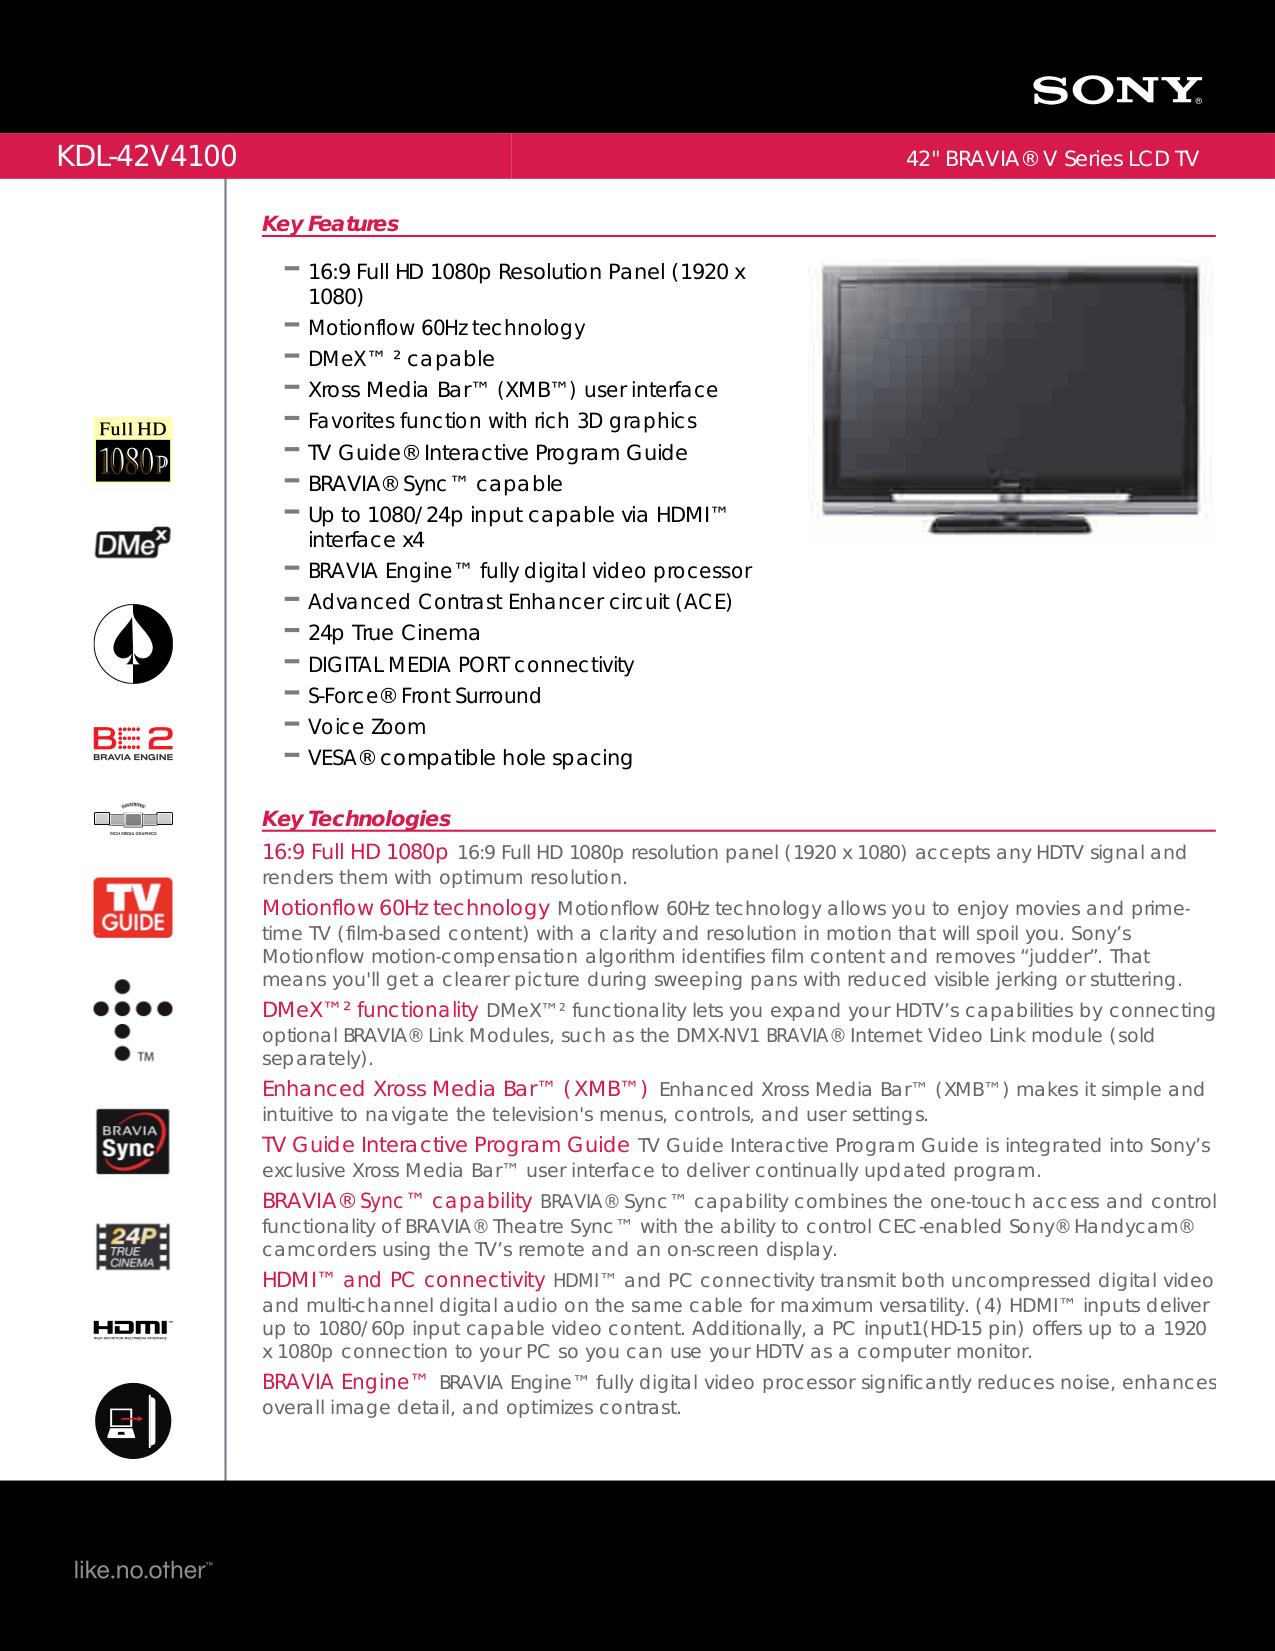 download free pdf for sony bravia kdl 42v4100 tv manual rh umlib com Sony KDL 42V4100 Power sony kdl-42v4100 service manual